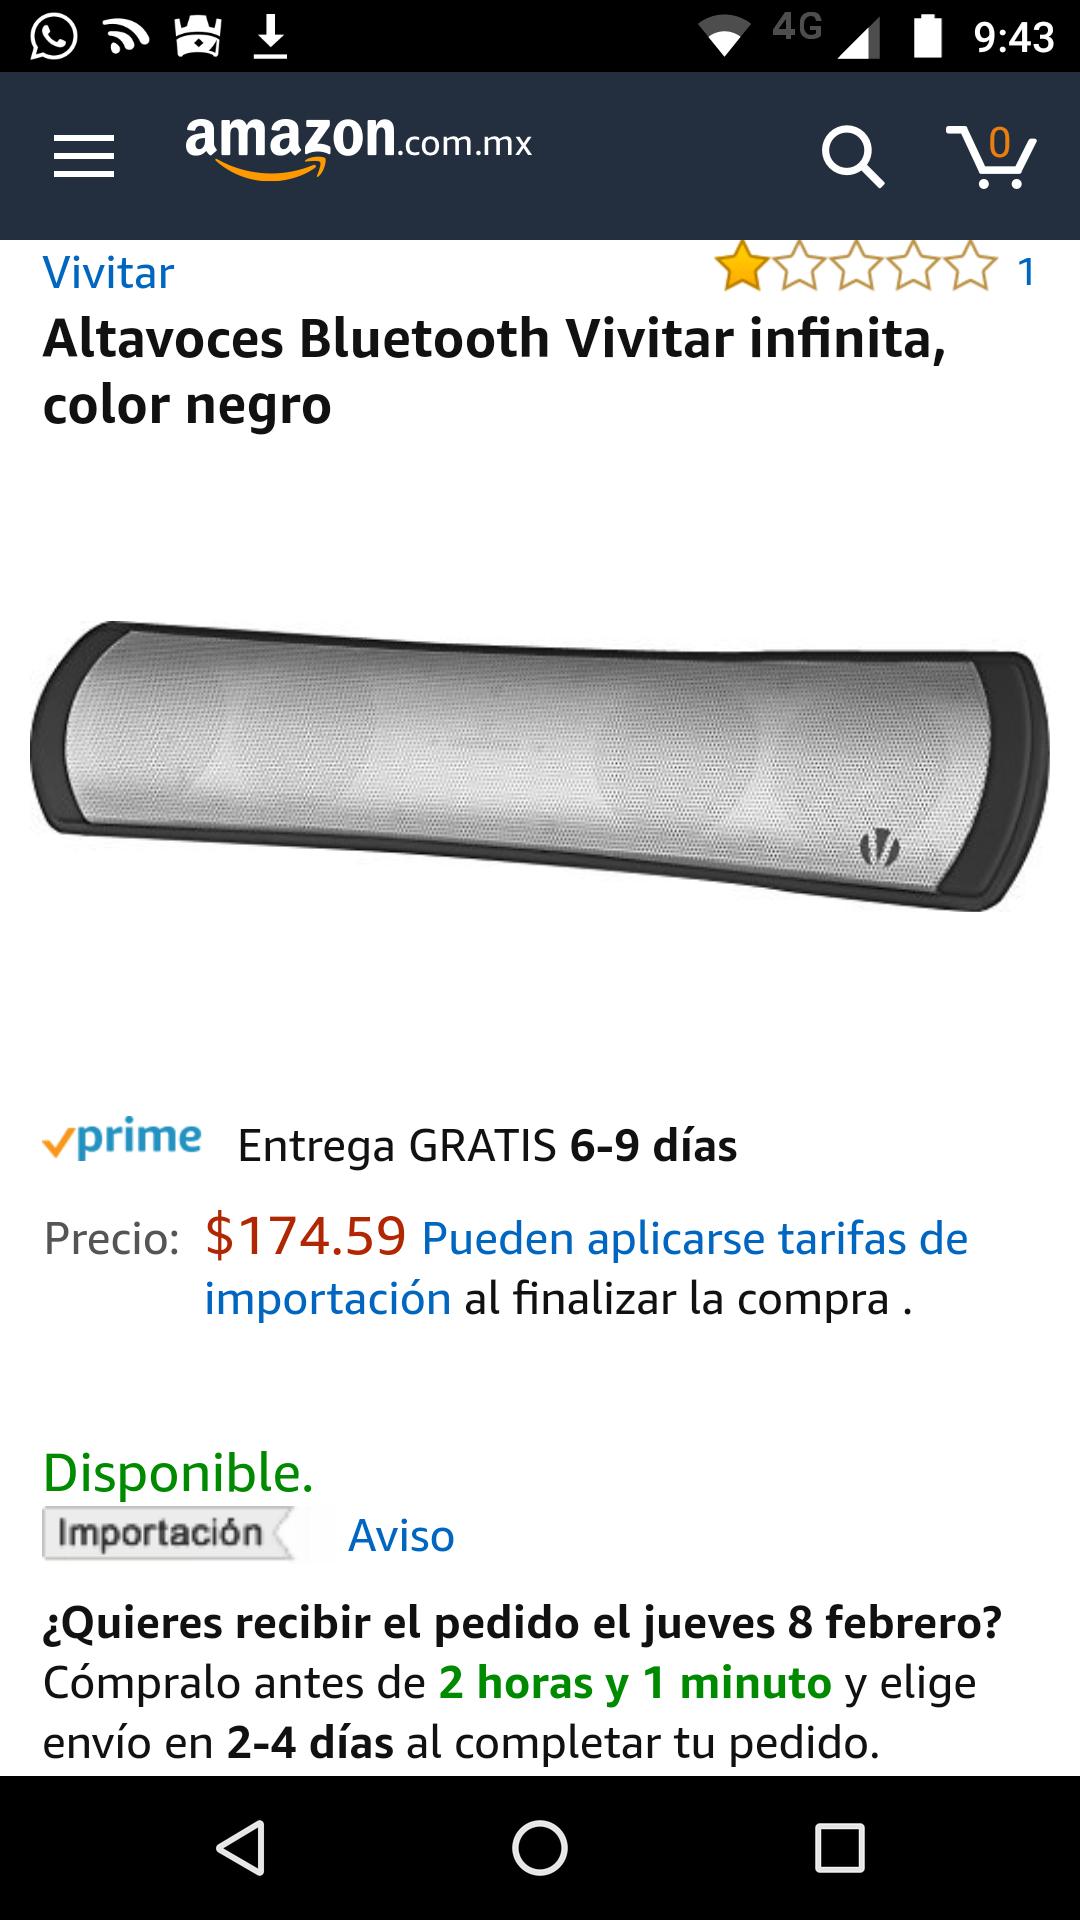 Amazon México: Altavoces Bluetooth Vivitar infinita, color negro